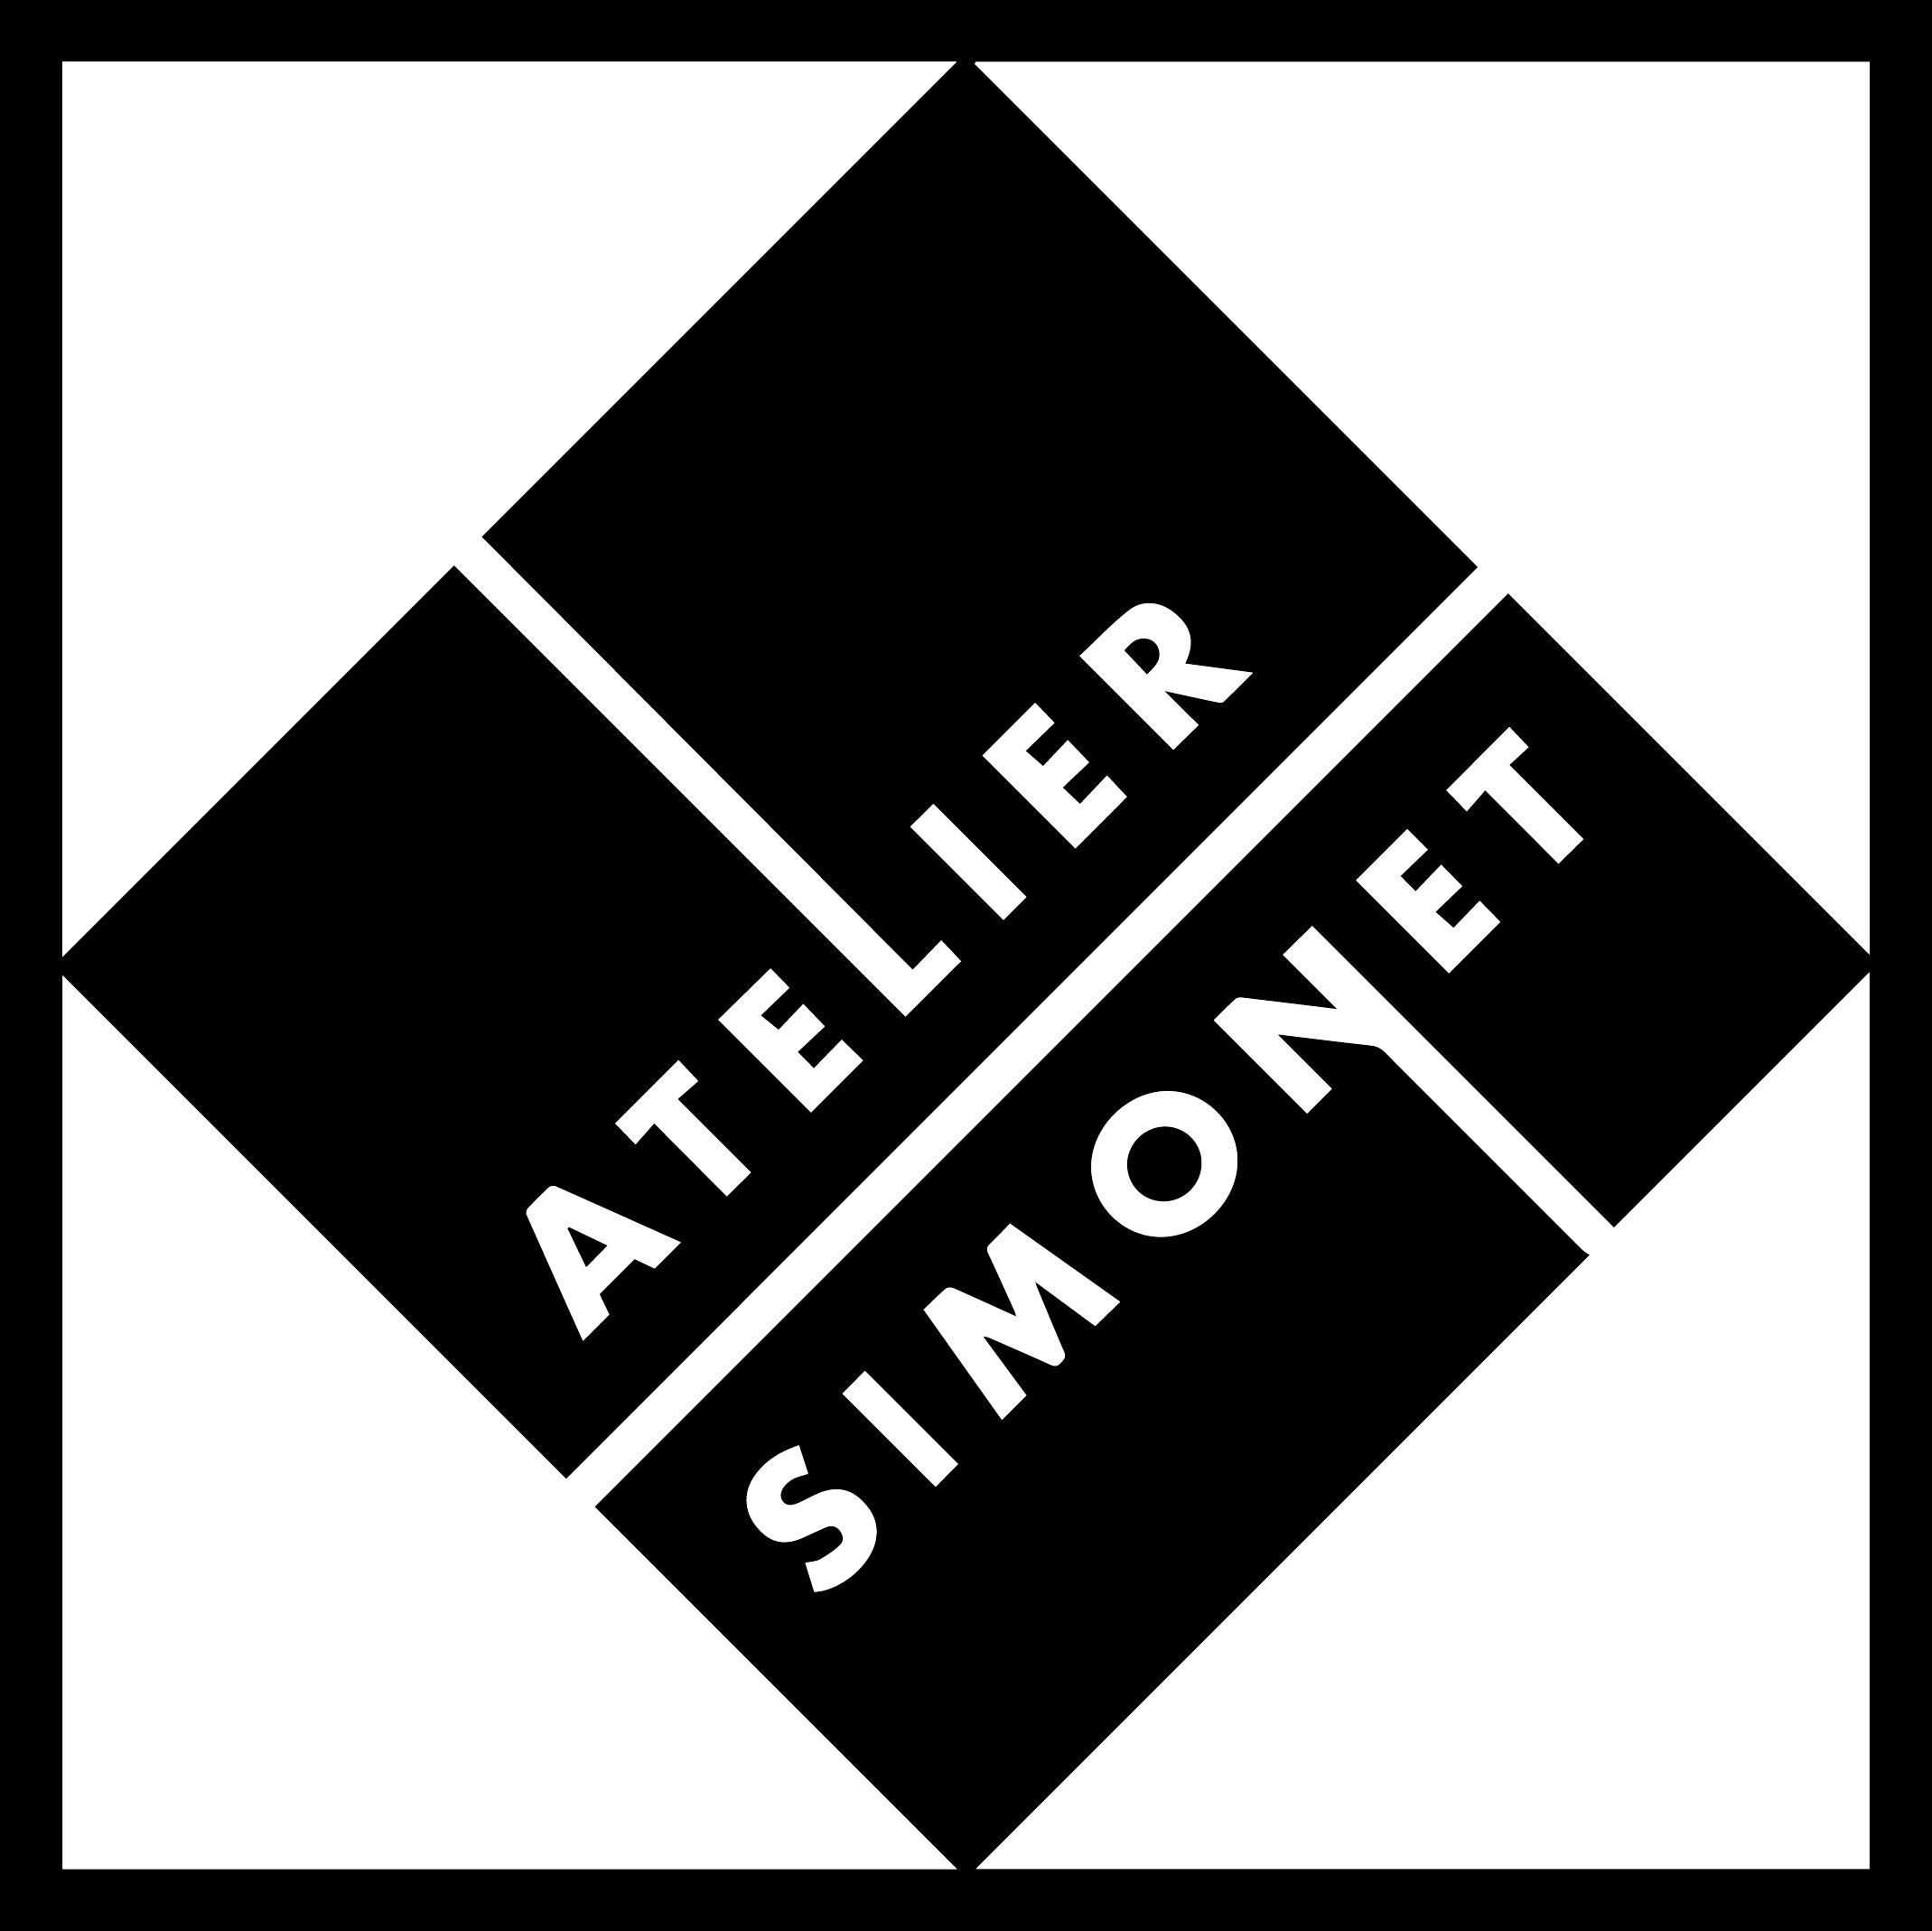 Atelier Simonet